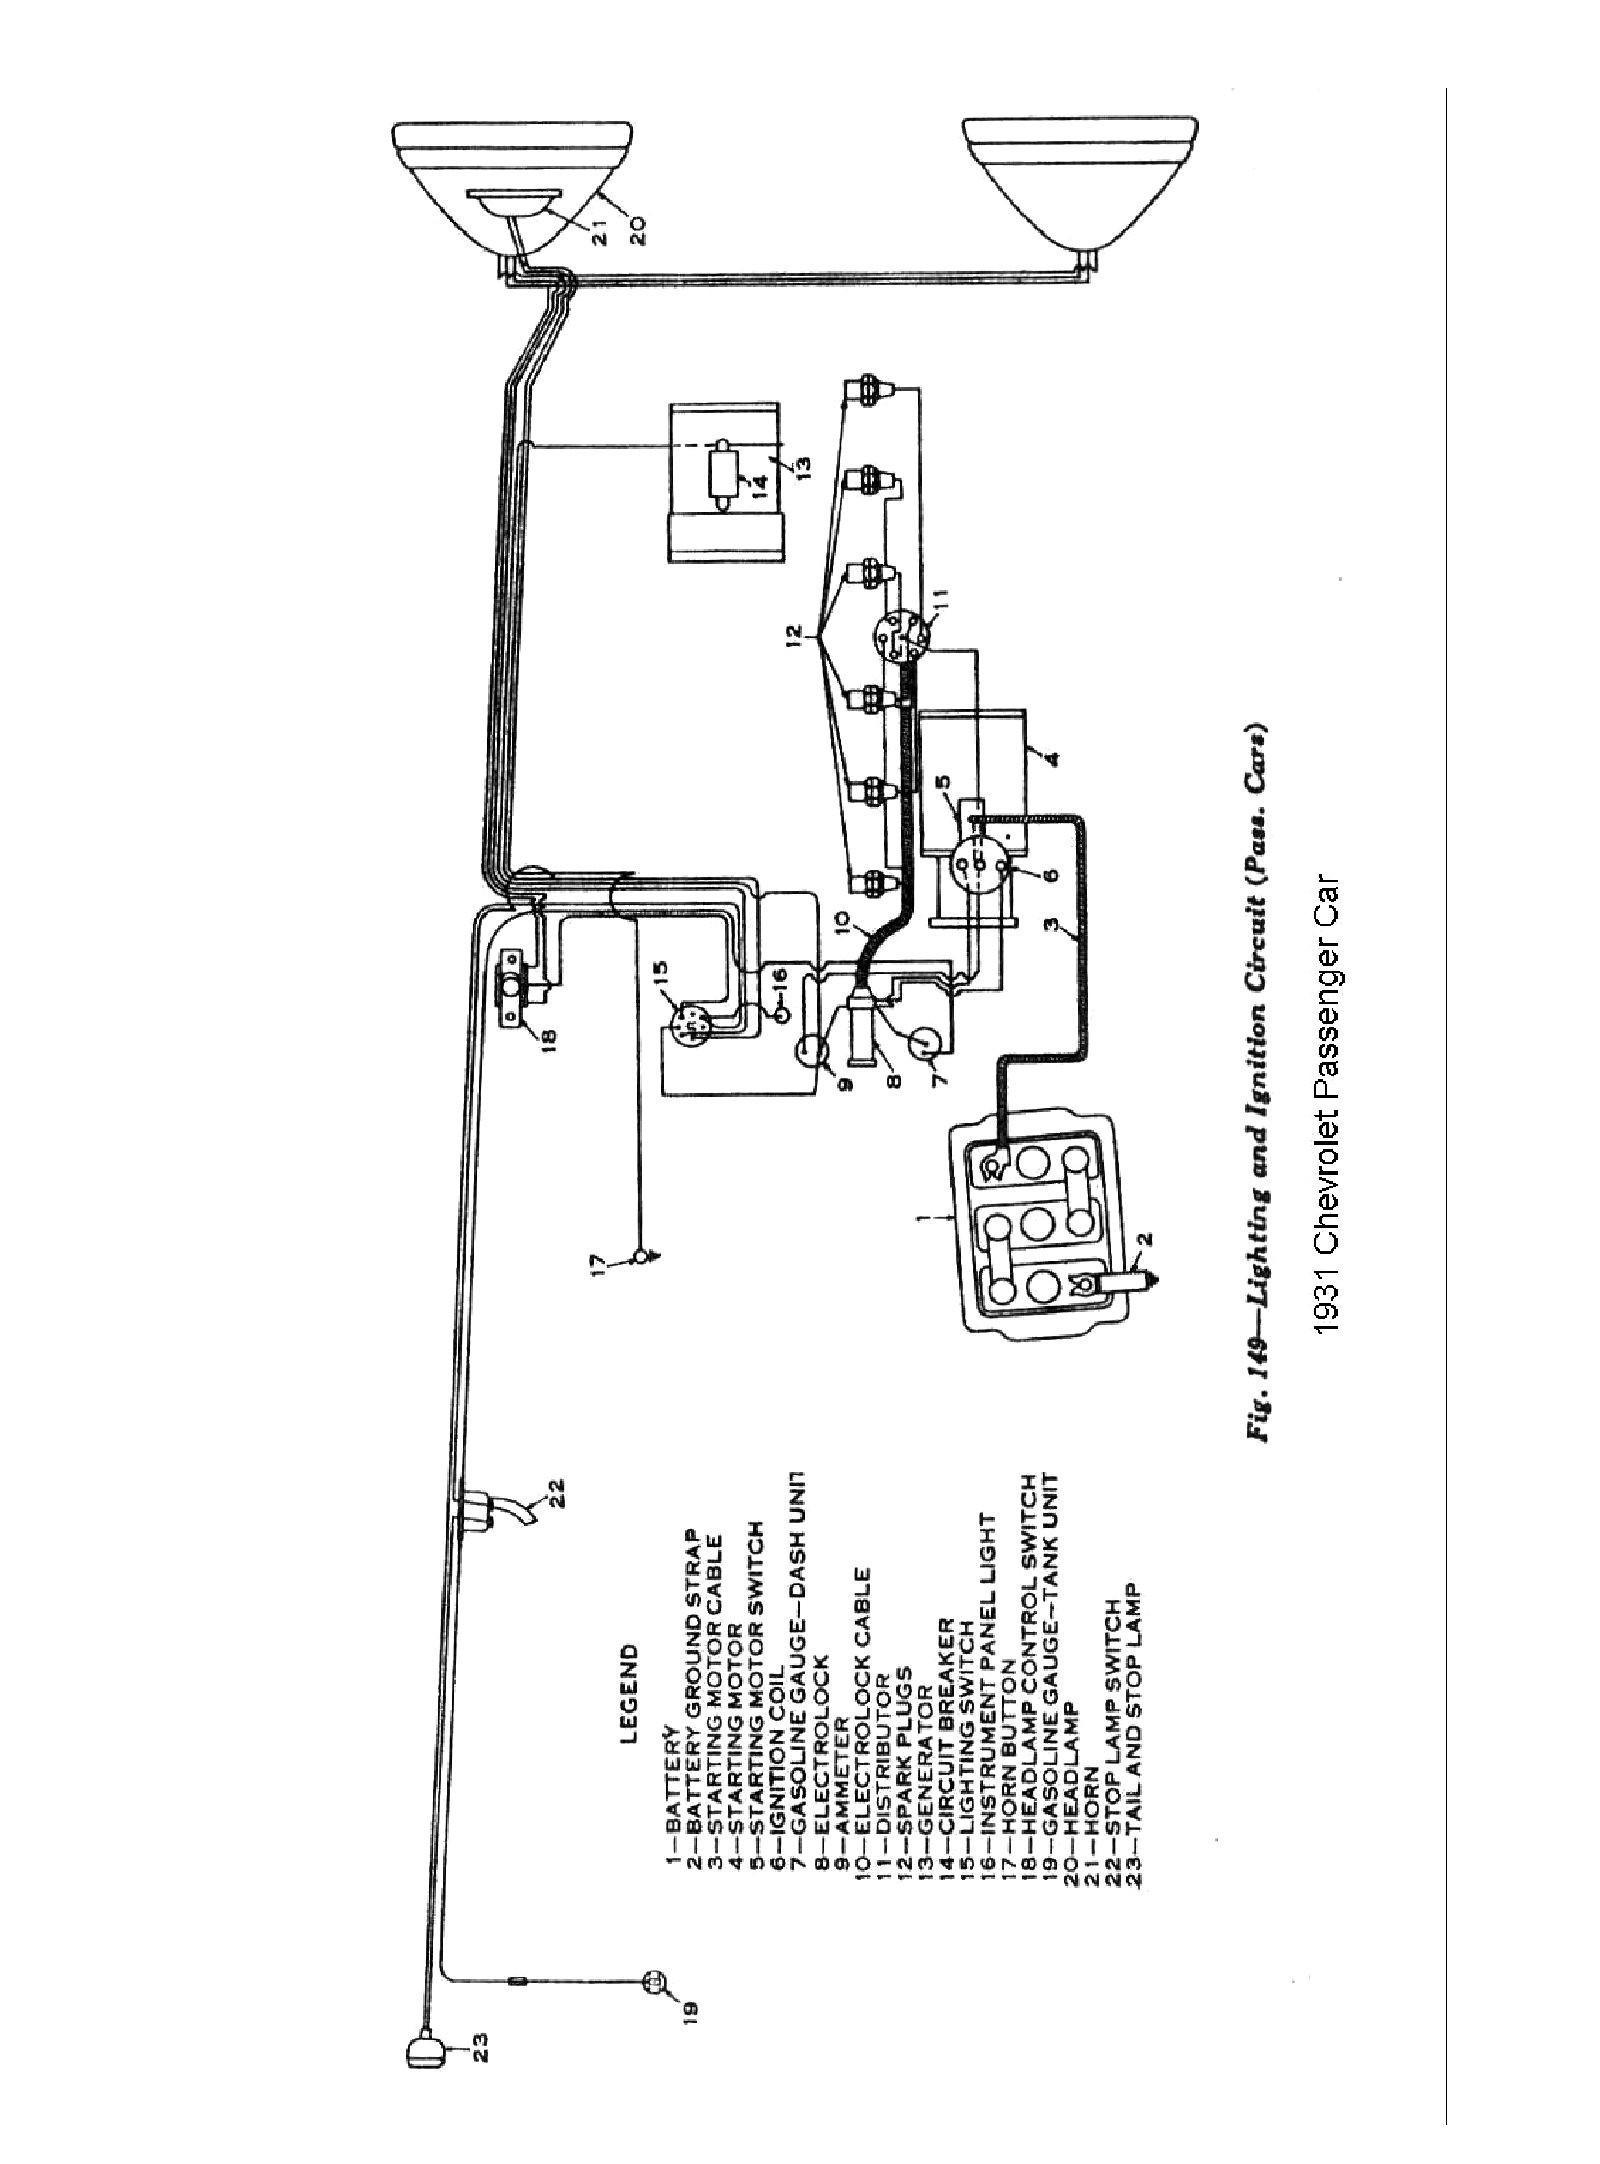 5 9 cummins fuel system diagram precedence method project management engine 2 my wiring